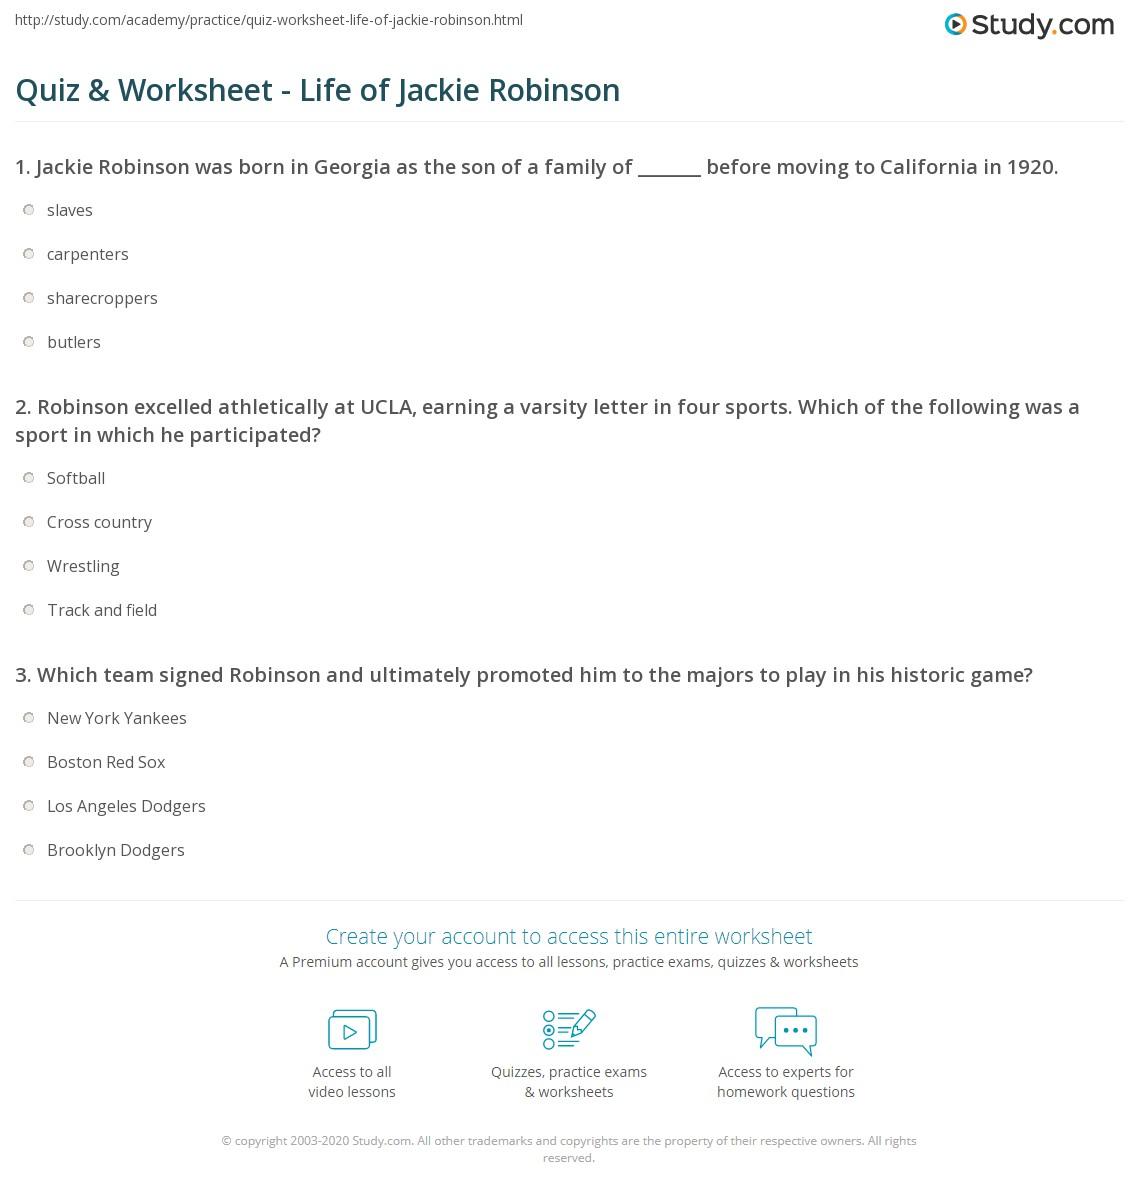 Jackie Robinson Paper Outline 100 Original